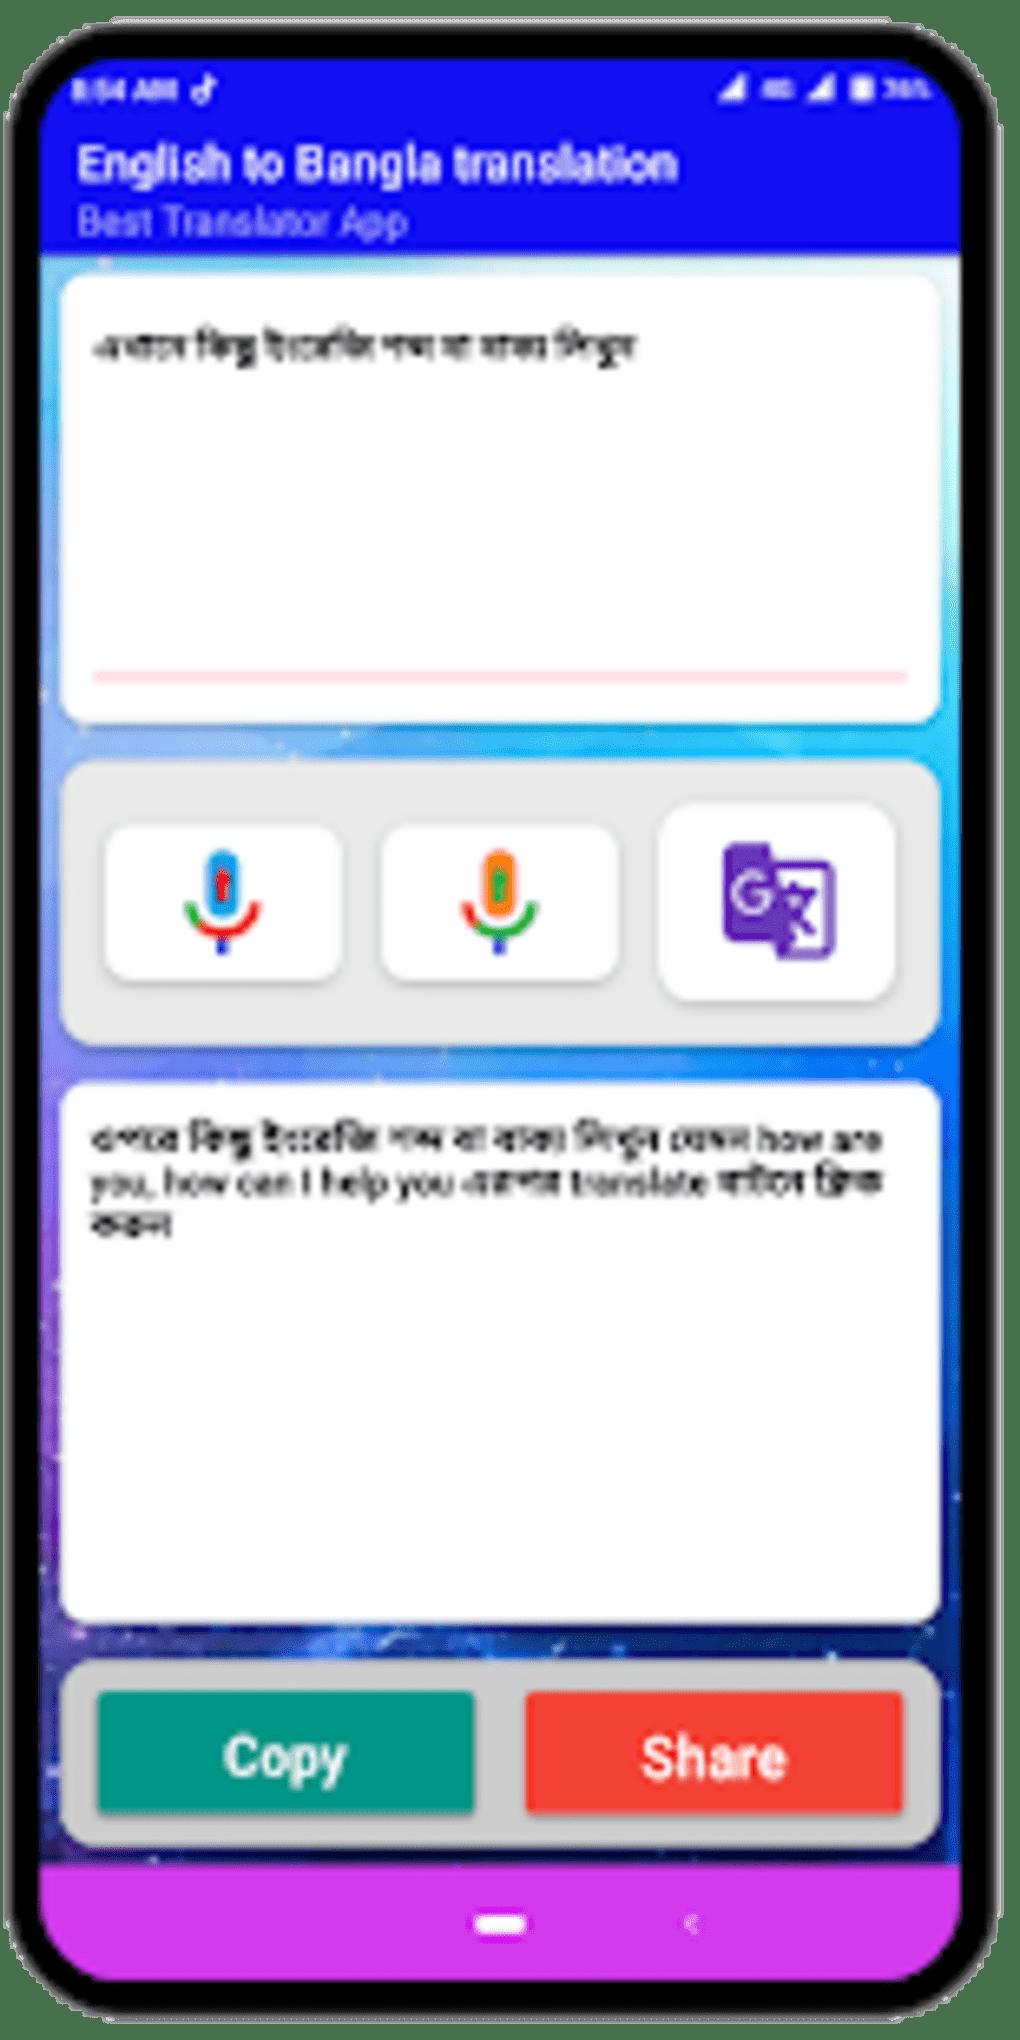 English to Bangla translation for Android - Download